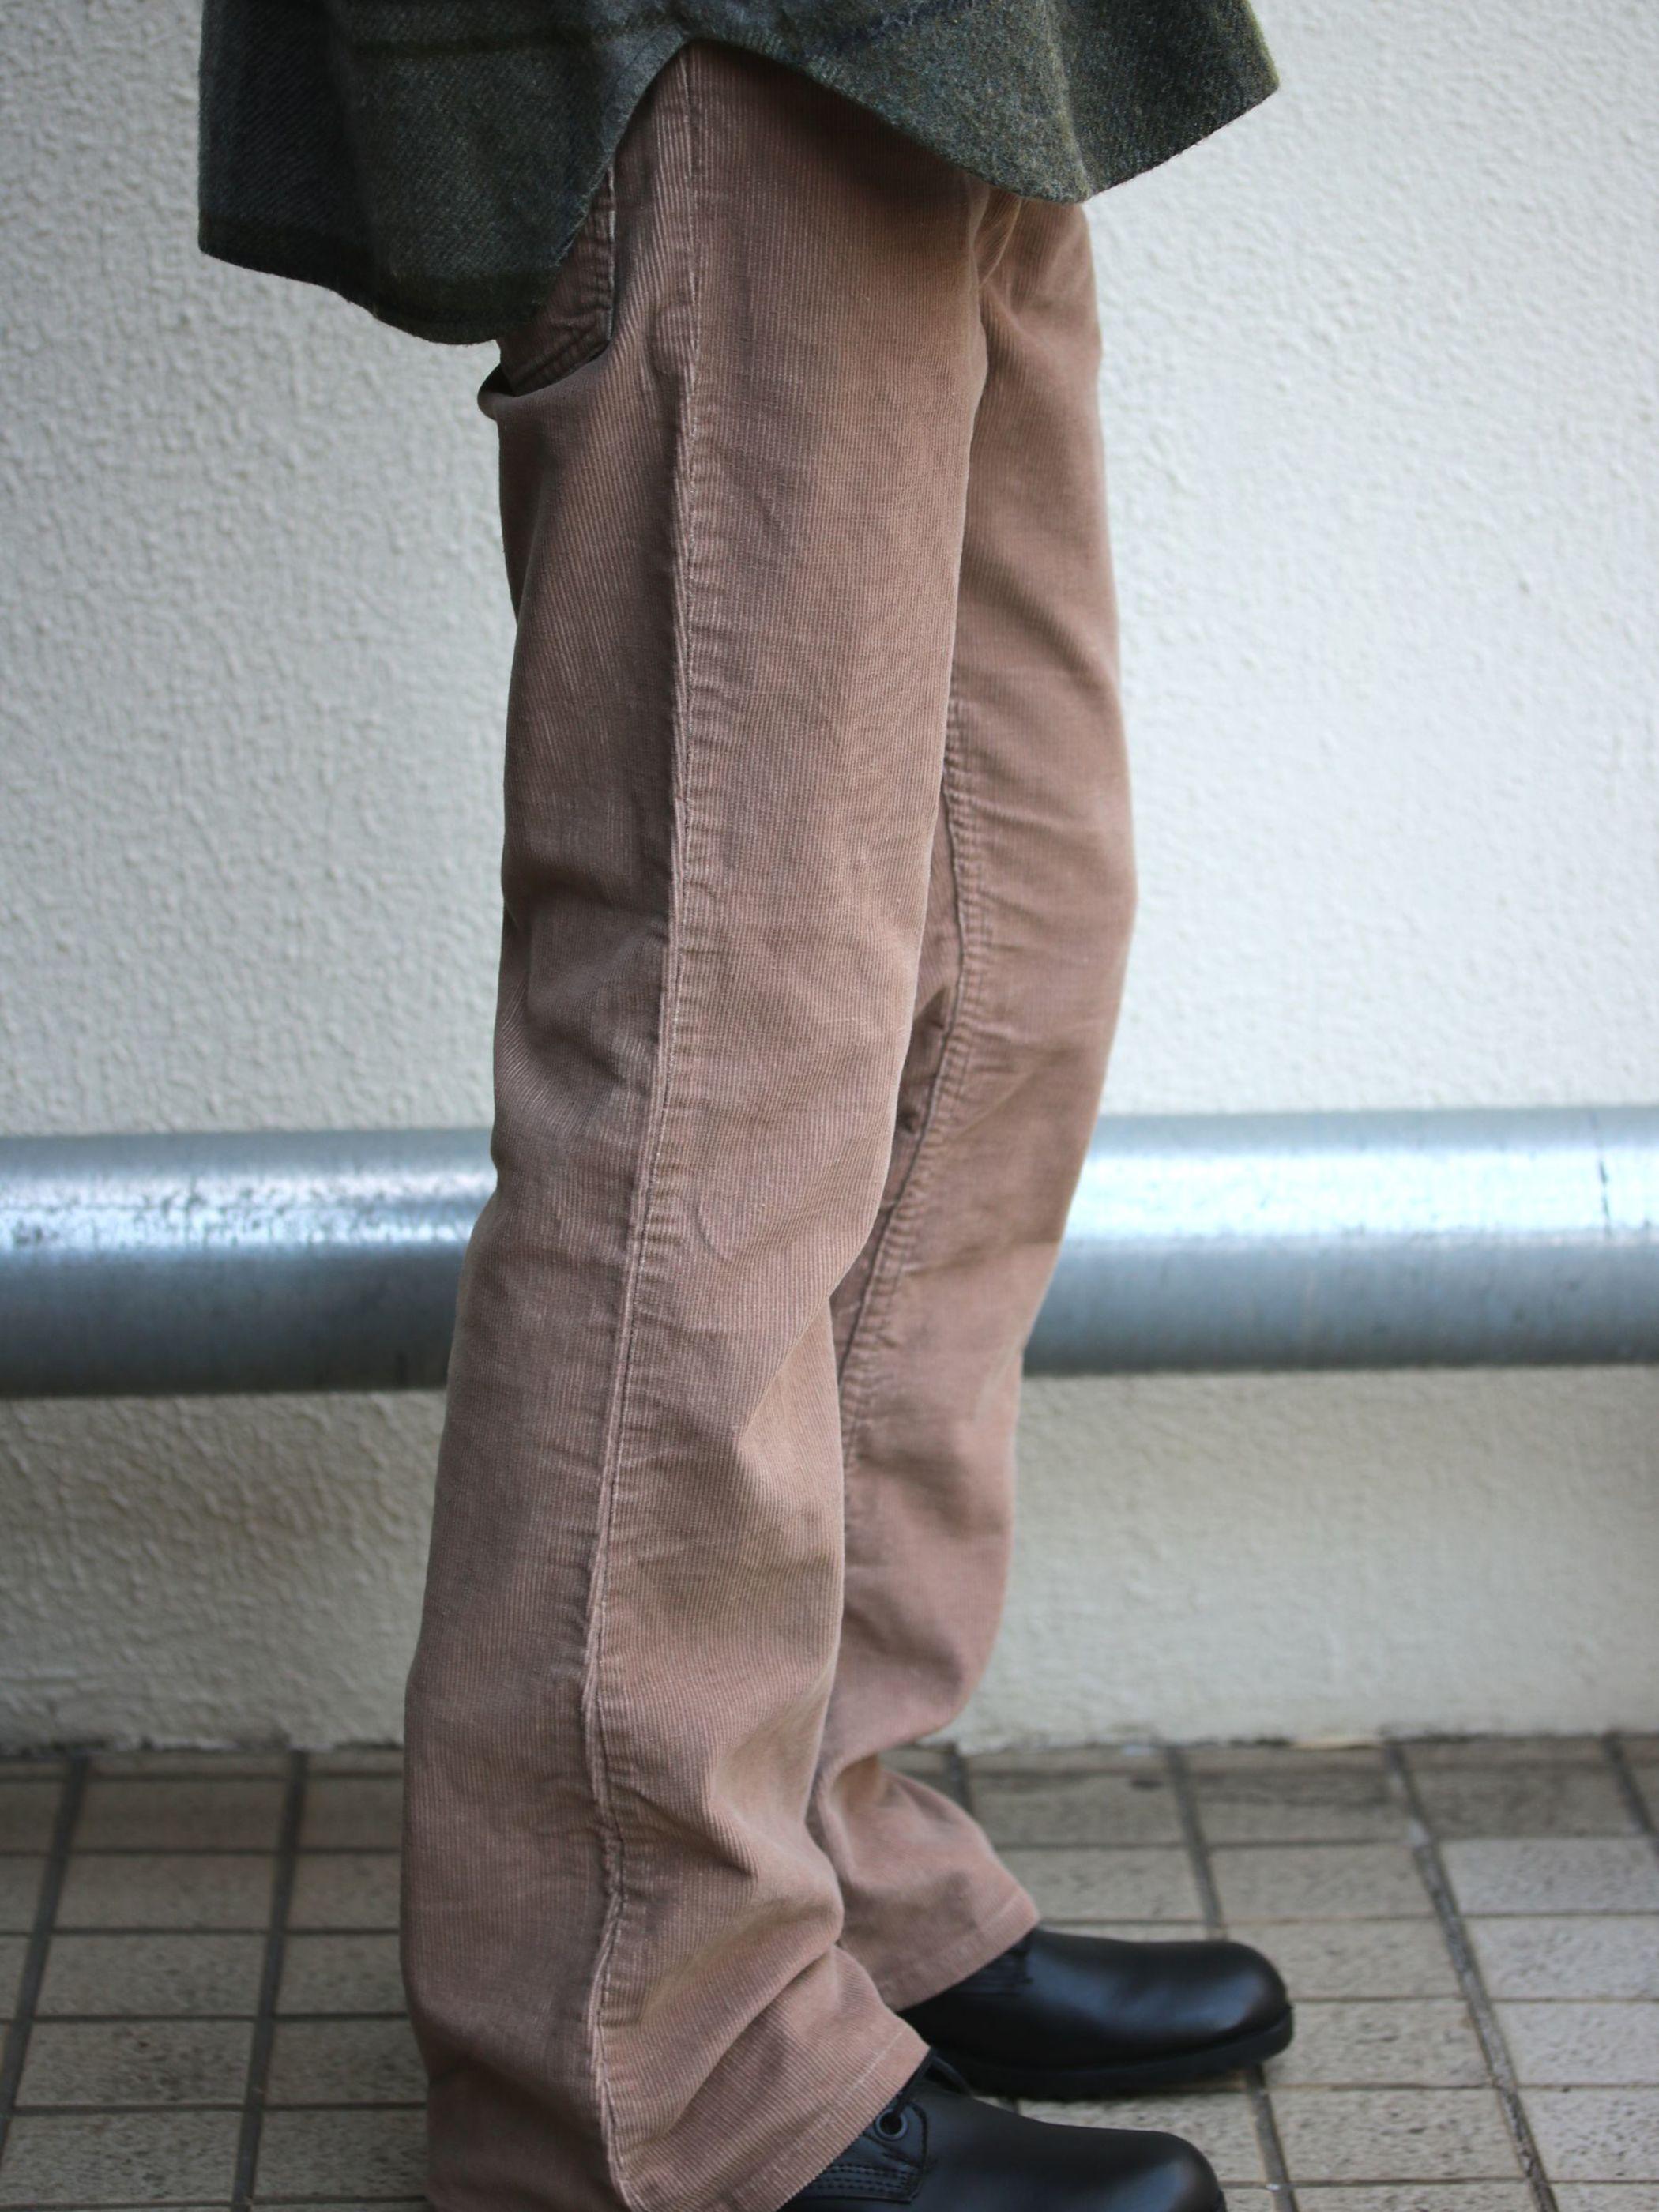 1970s/ Levi's 646 corduroy pants